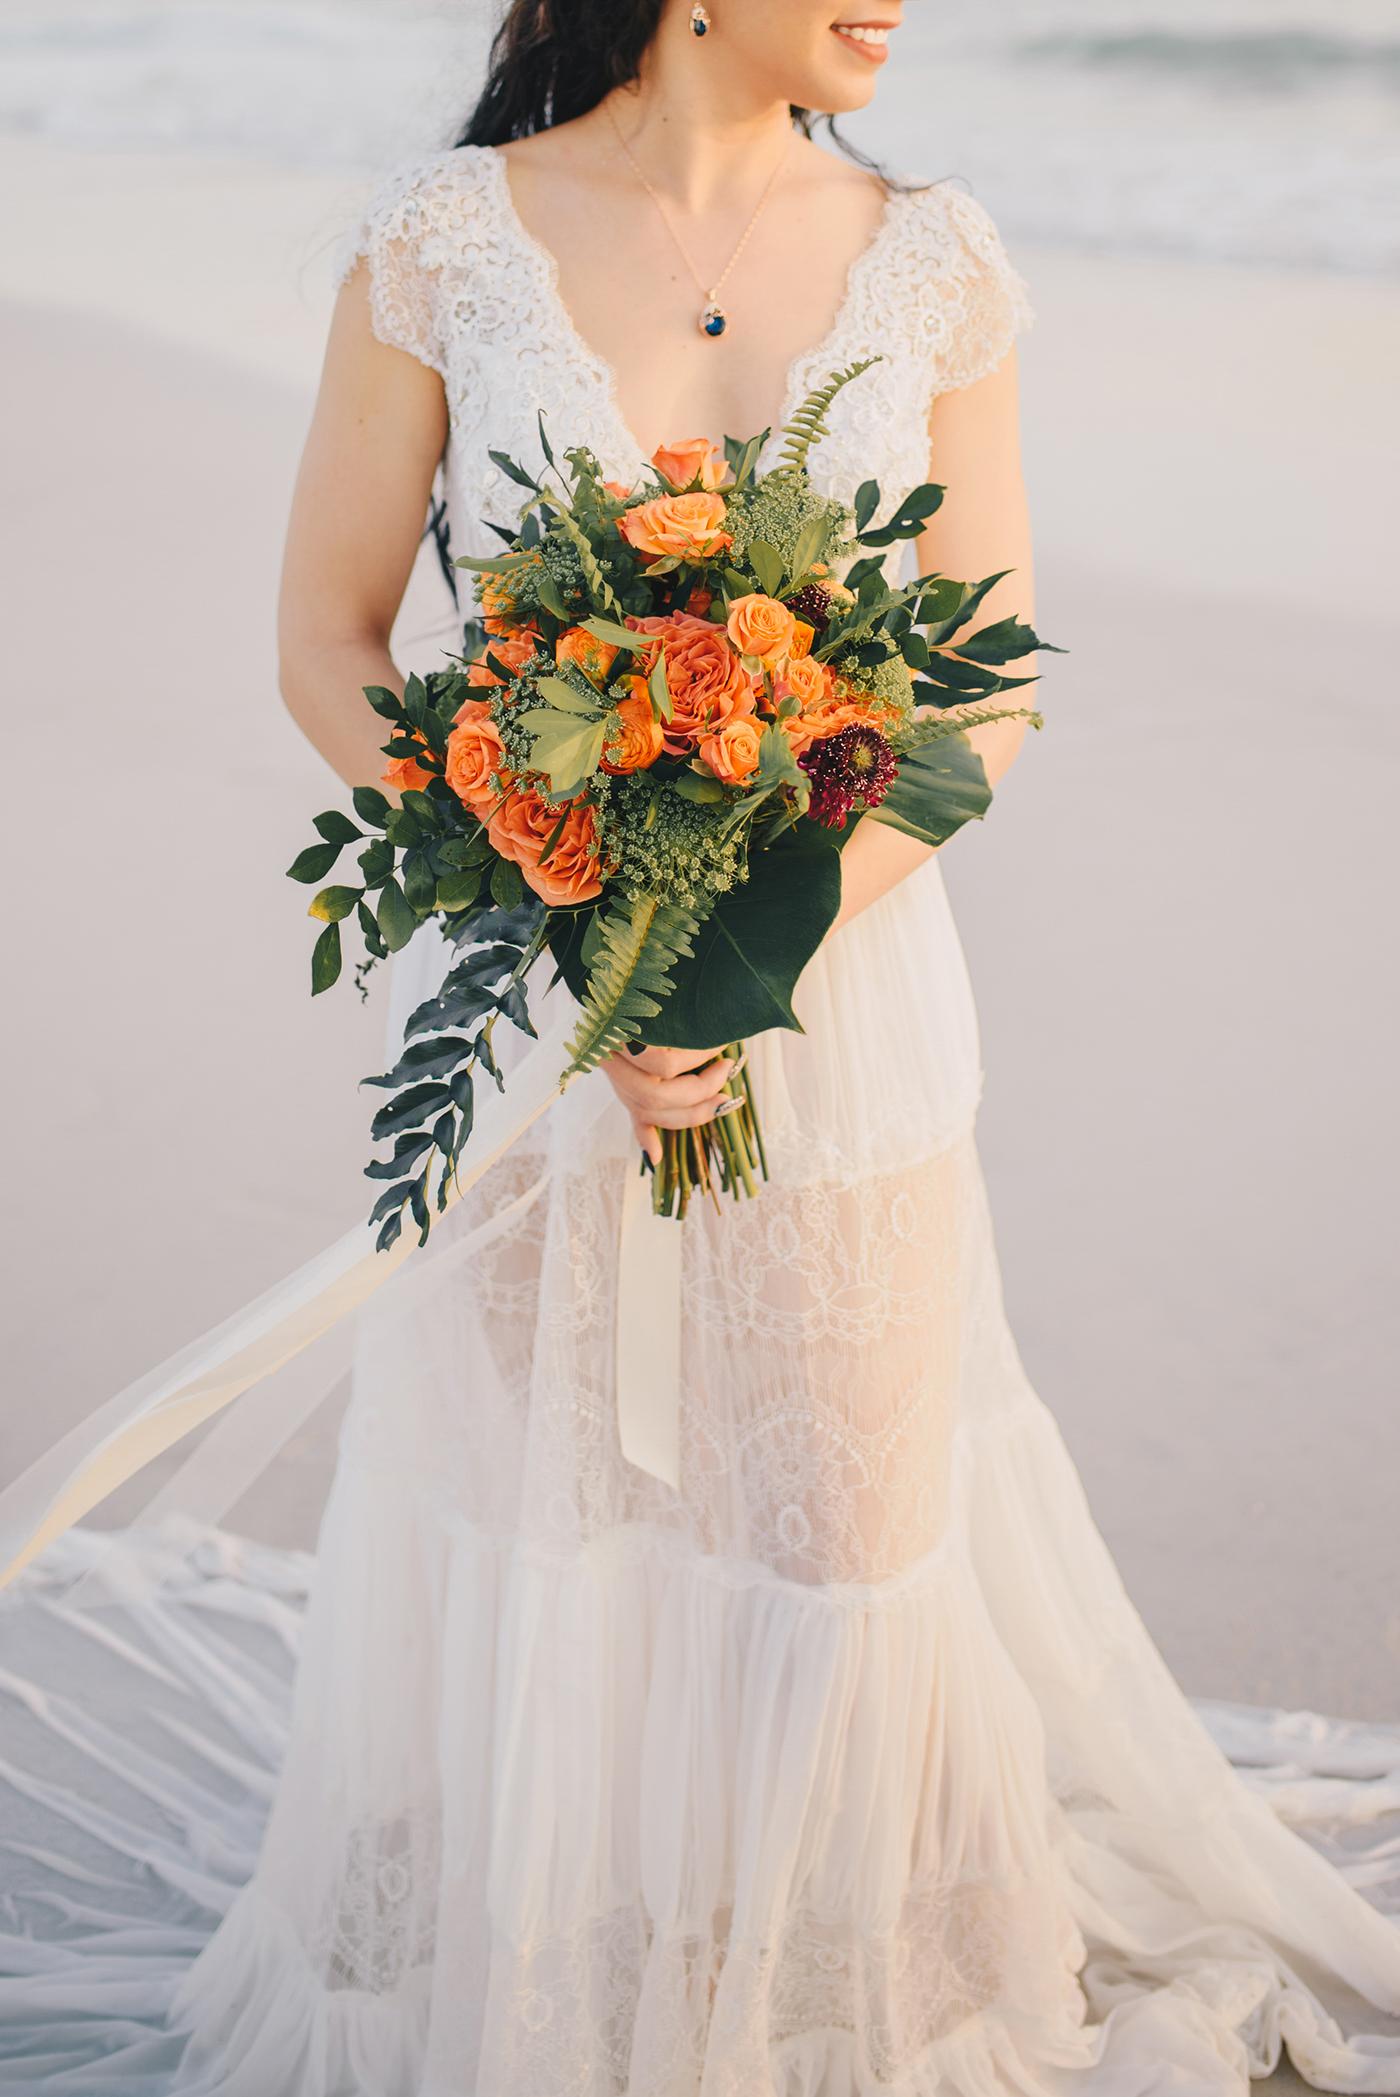 Los-Vargas-Photo-Moana-Wedding-Style-shoot-72.jpg